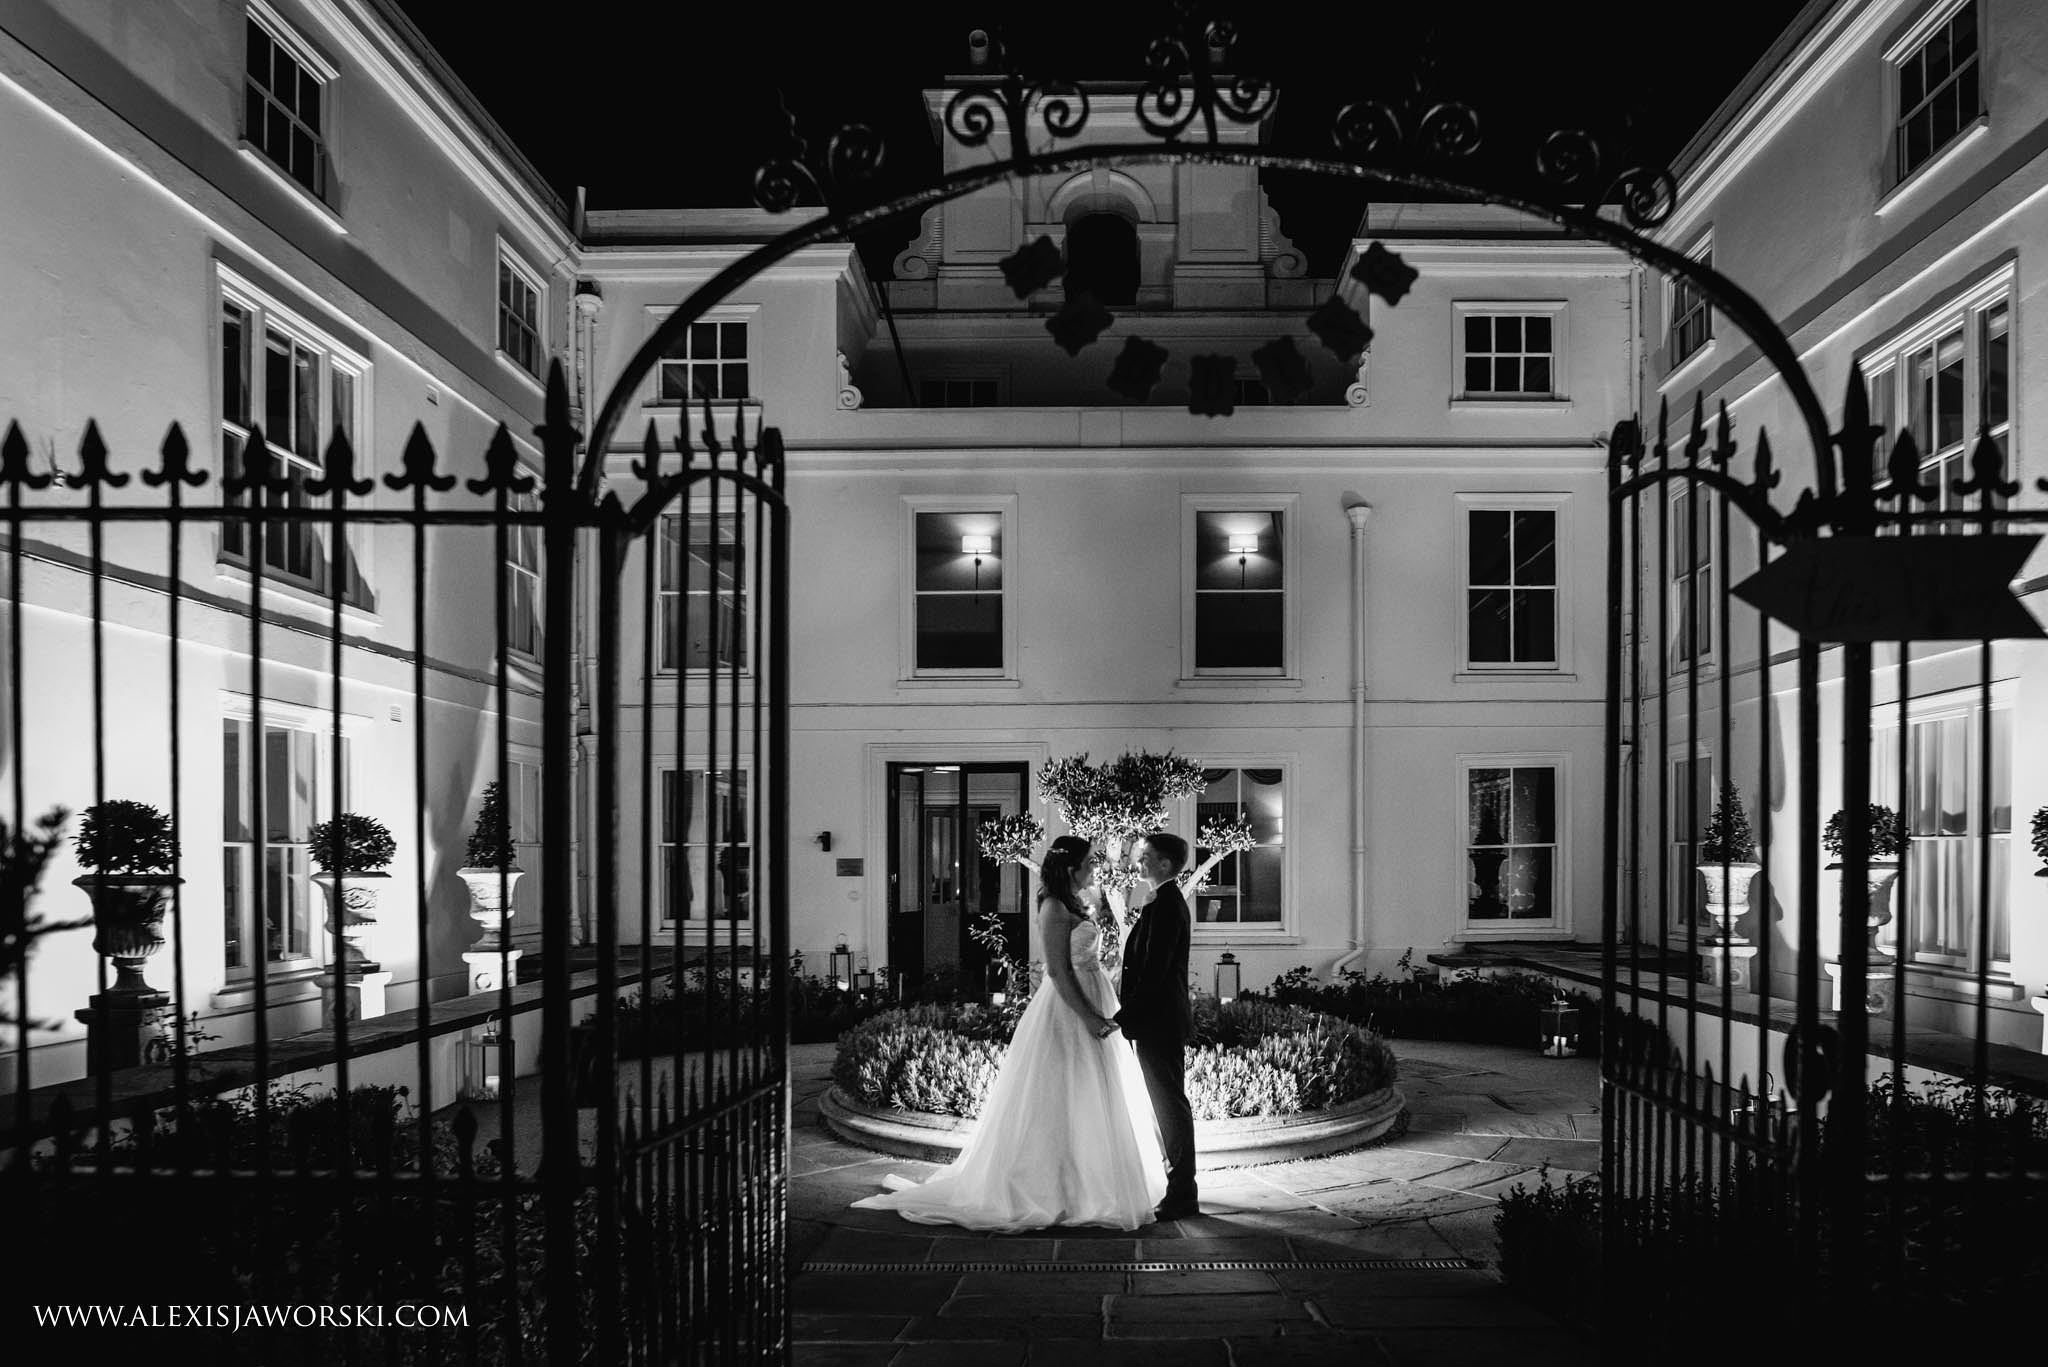 bride and groom night portrtait